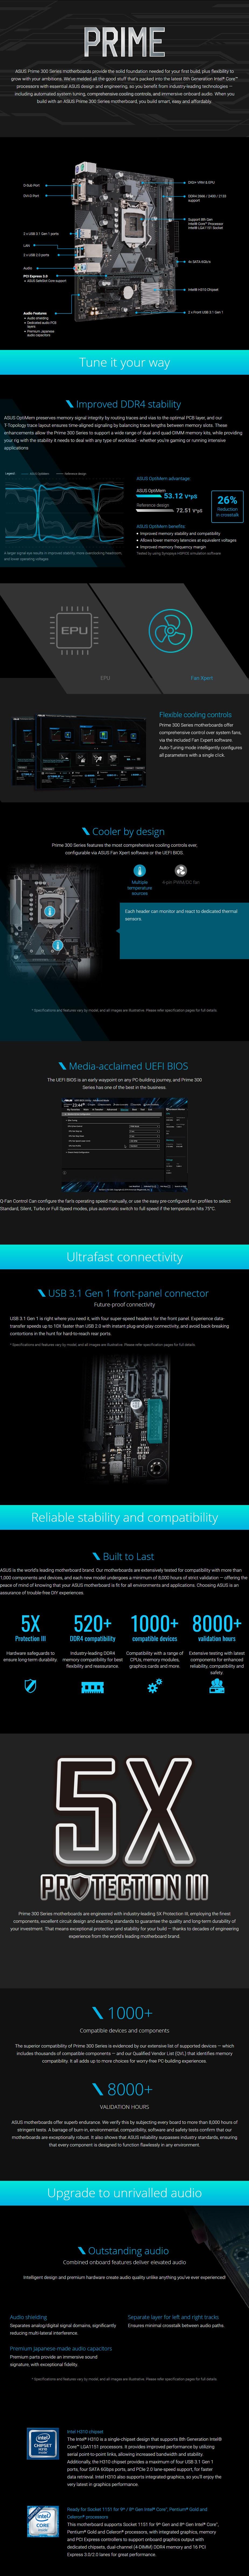 ASUS PRIME H310M-K R2.0 LGA 1151 Micro-ATX Motherboard - Overview 1